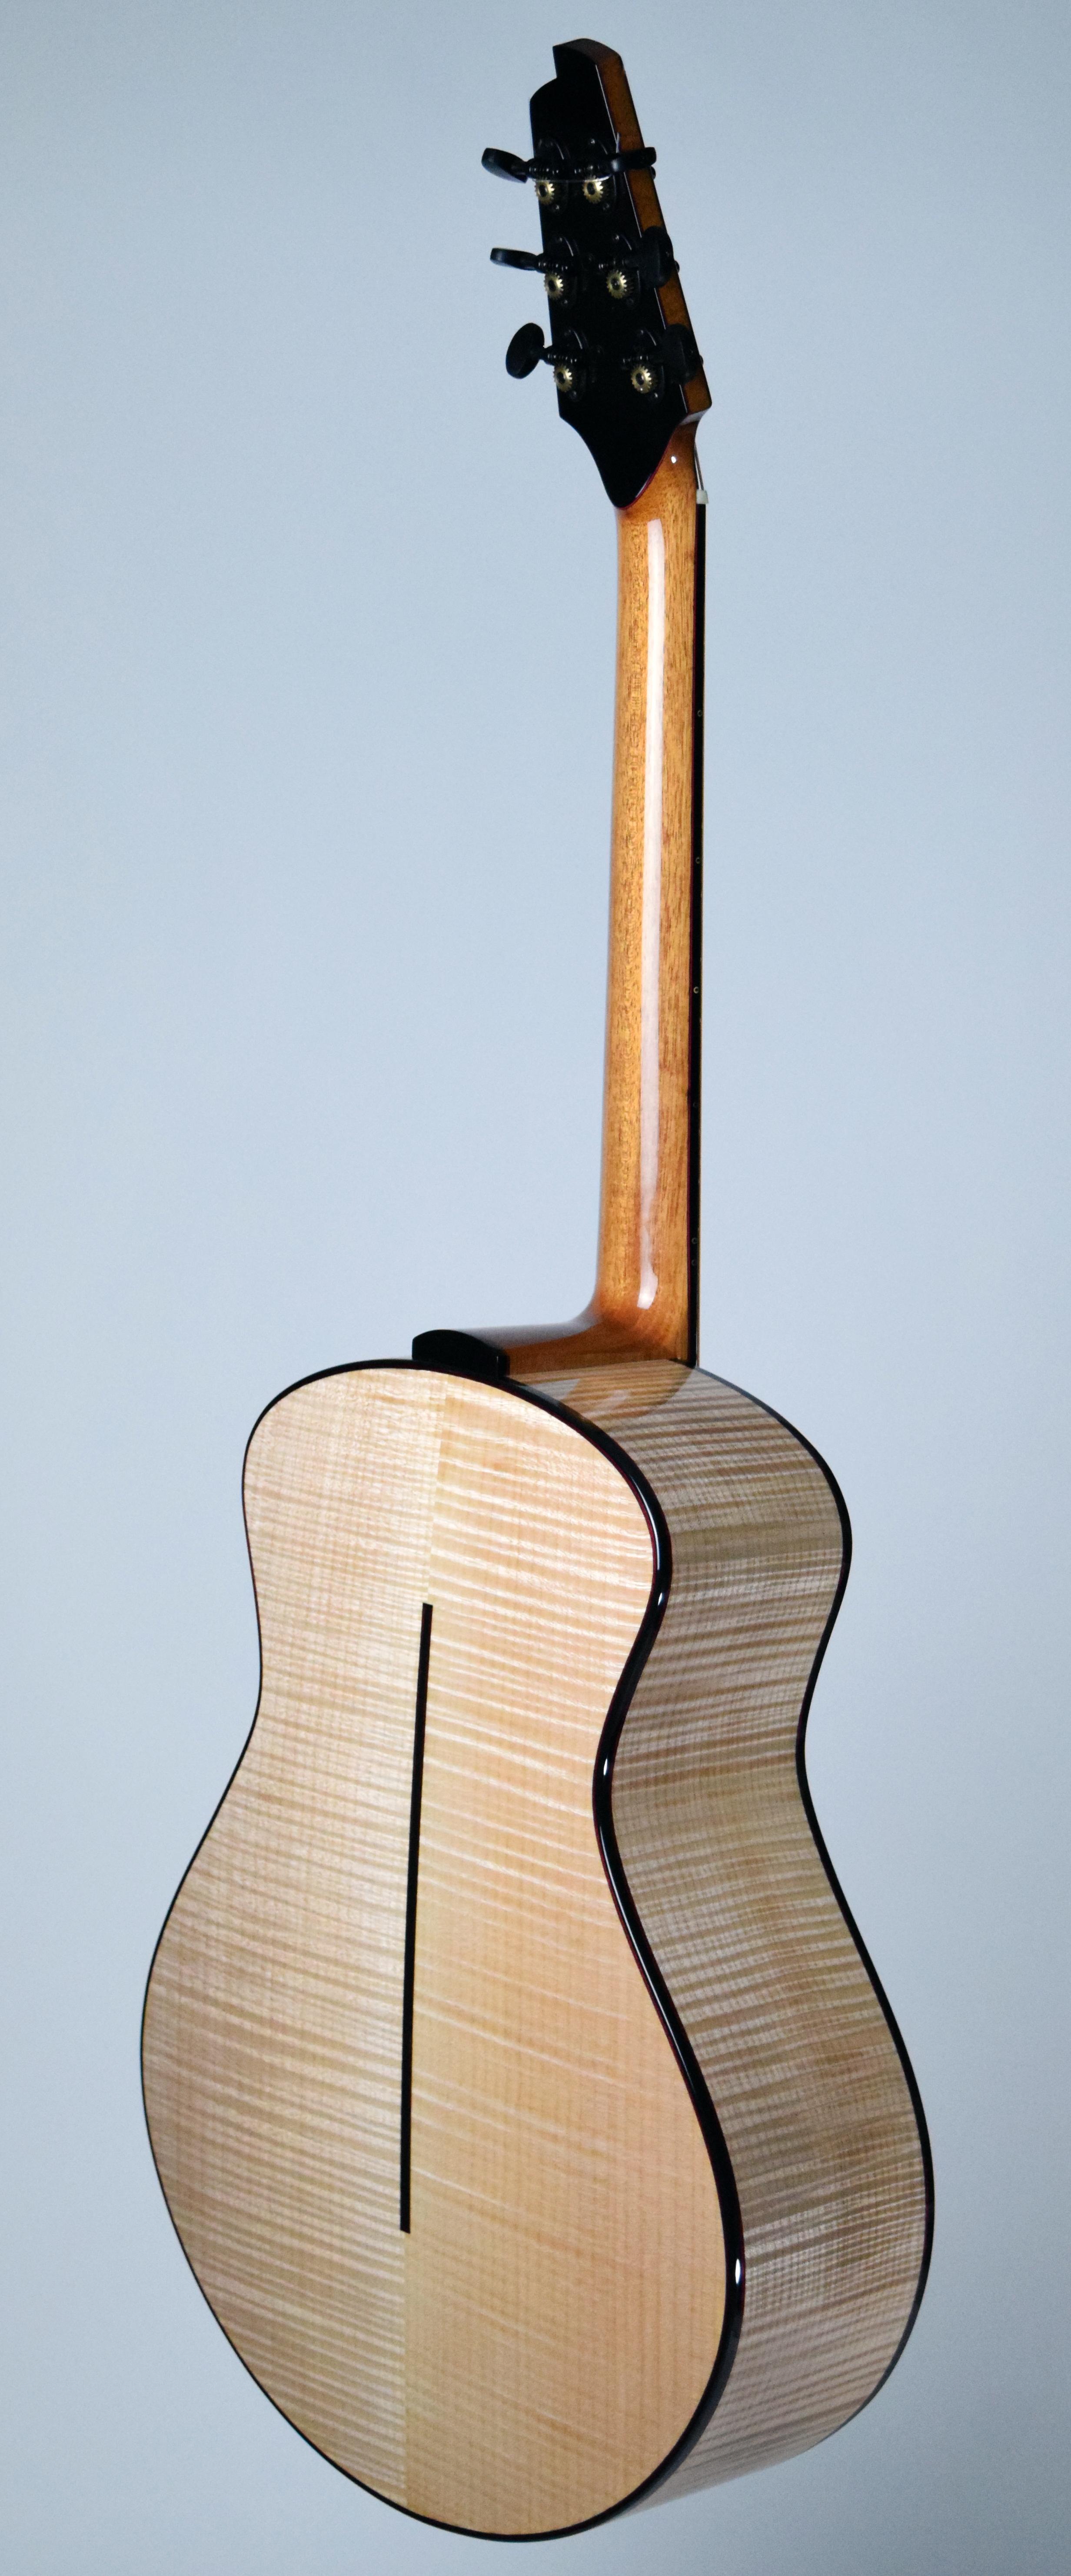 Maple/Italian Spruce